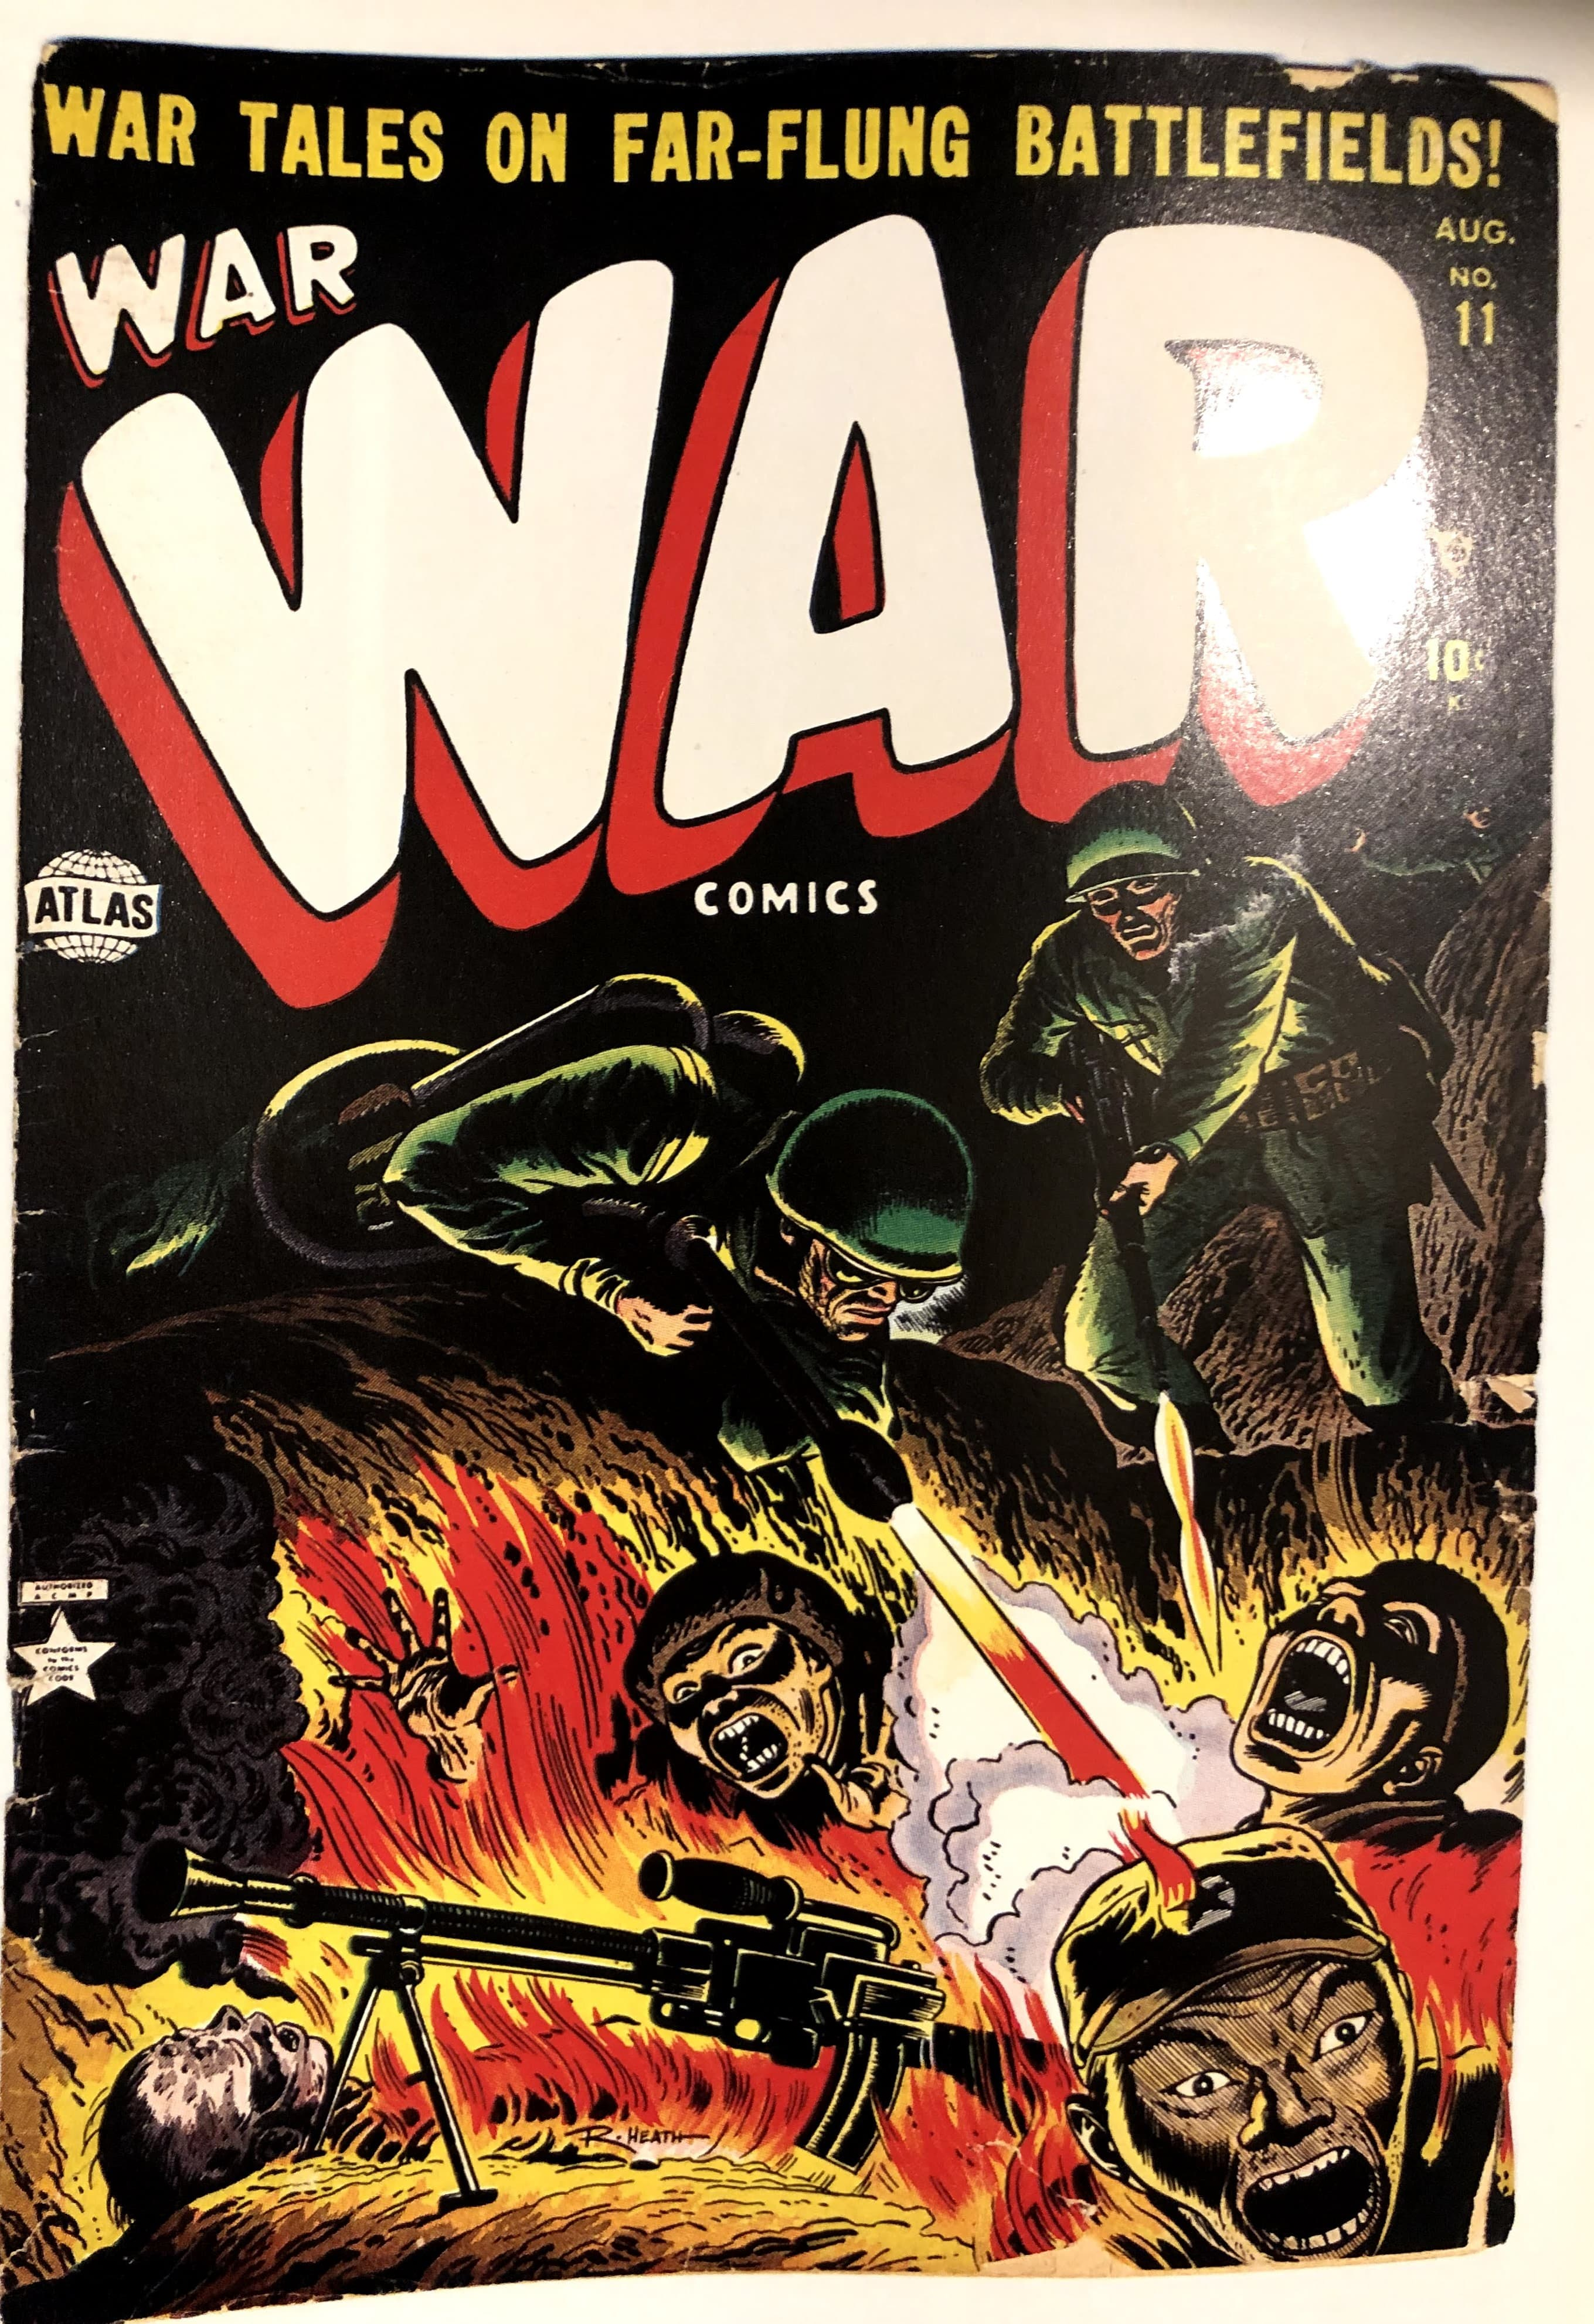 Classic comics illustrators : Frank Frazetta, Russ Heath, Burne Hogarth, Russ Manning, Mark Schultz / [edited by Tom Spurgeon].